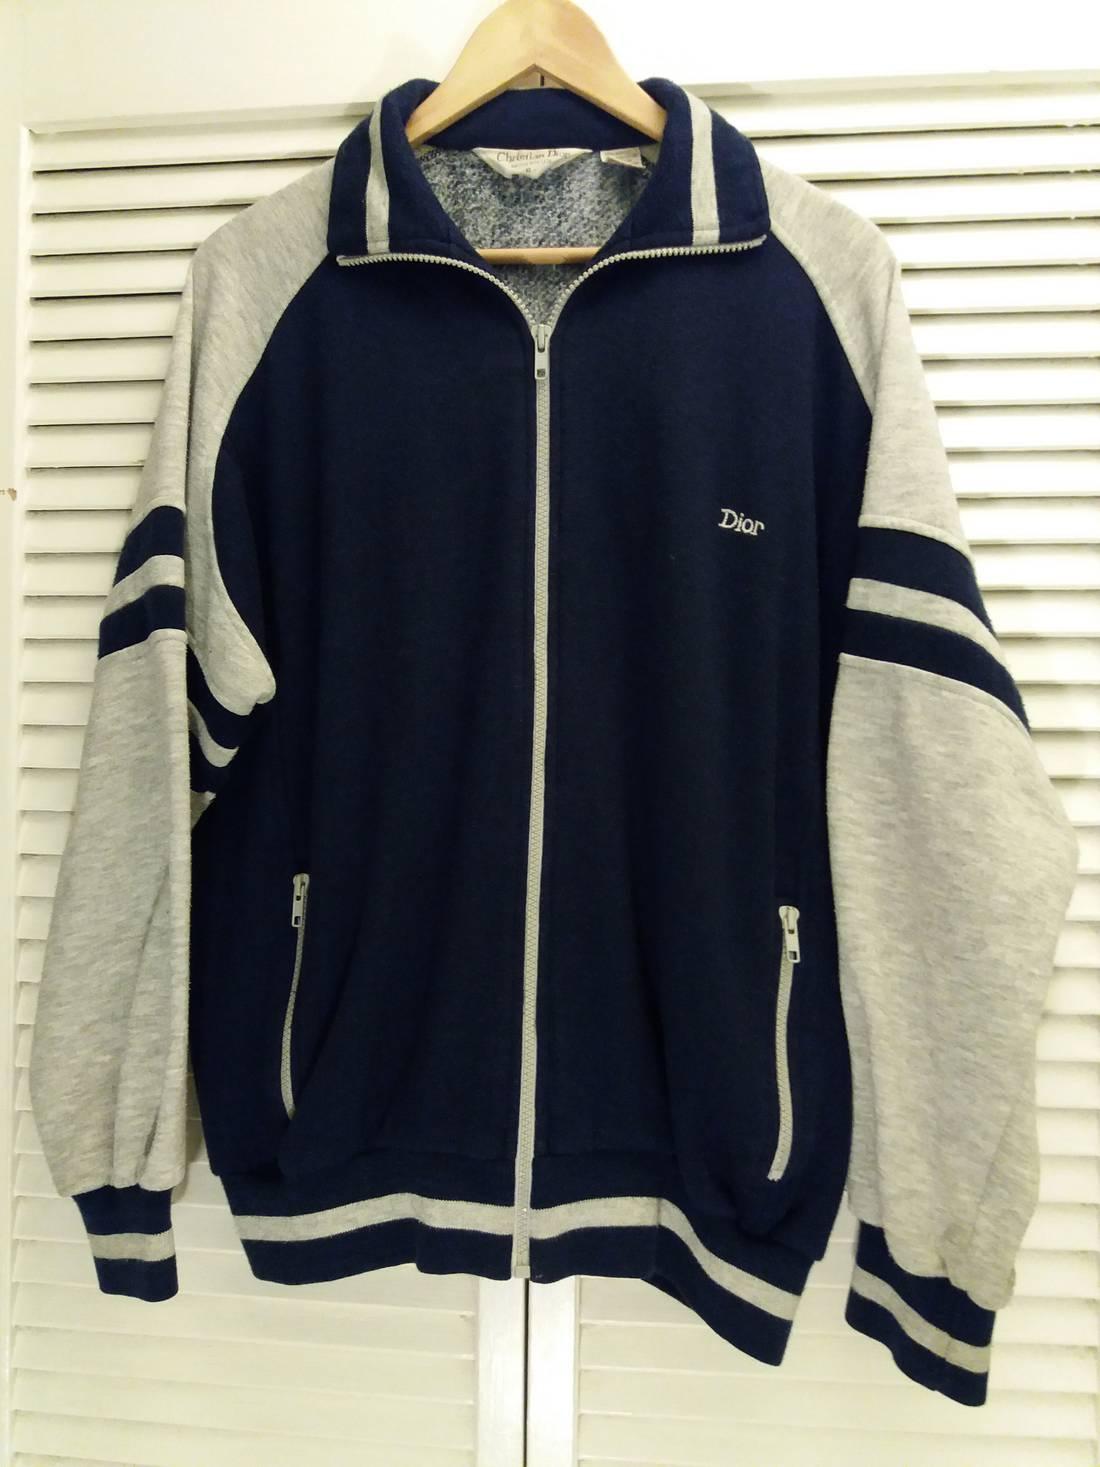 Rare!!! Vintage NFL spellout Embroidered Sweatshirt Pullover Vtg American Football Crewneck Jumper Jacket M size